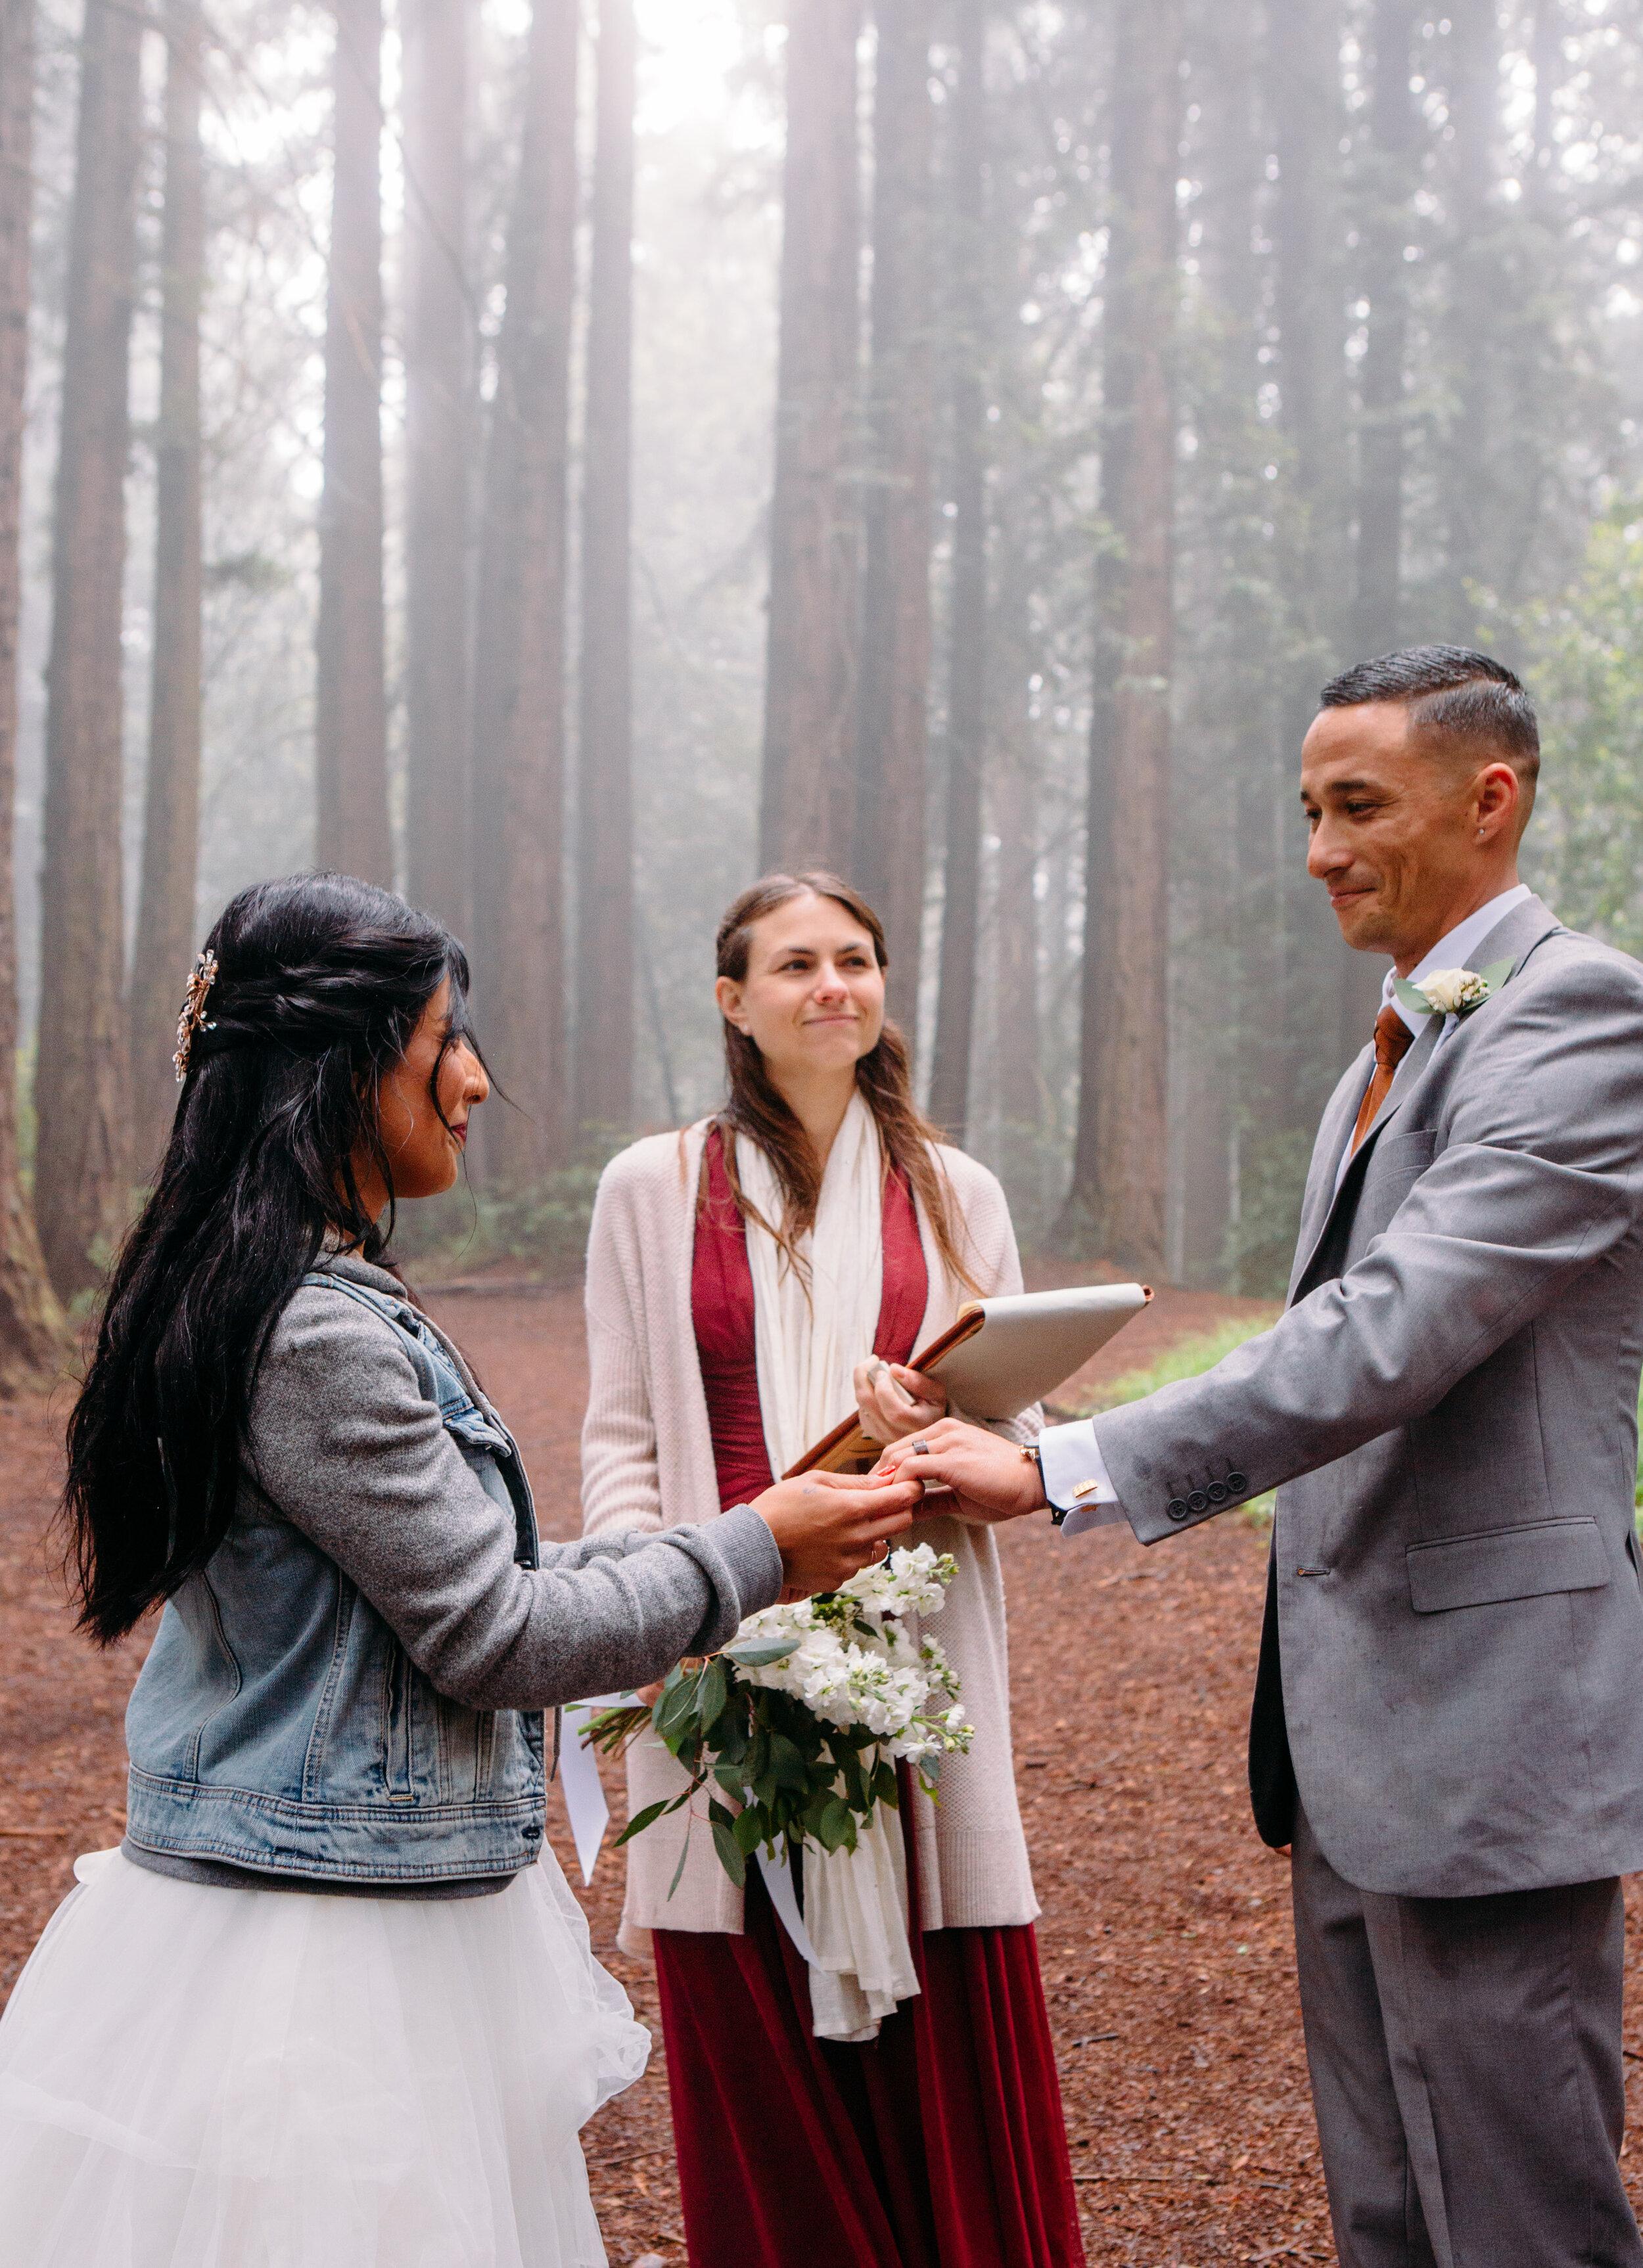 20190615-SanFrancisco-Redwood Regional-Vishali Kameron--61.jpg